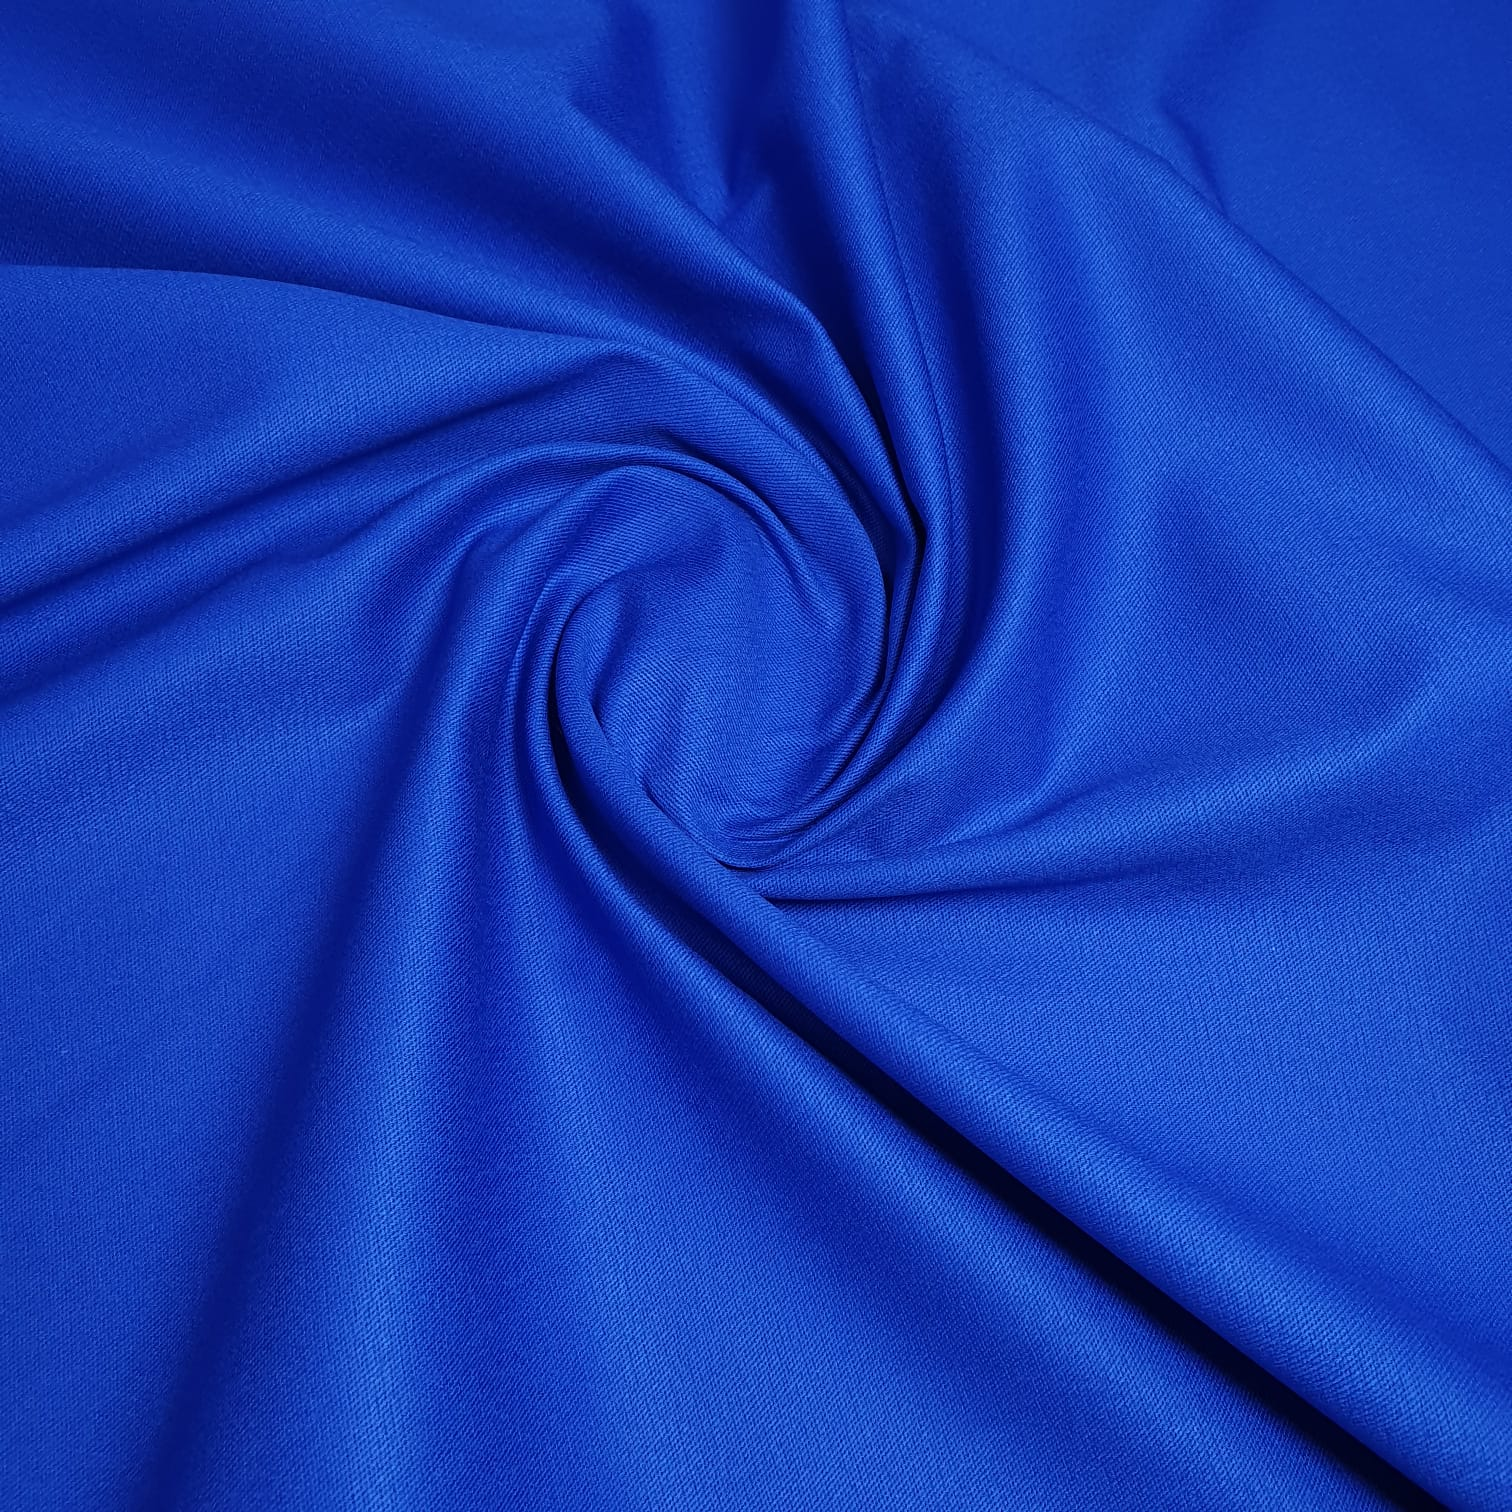 Brim Leve Azul Royal